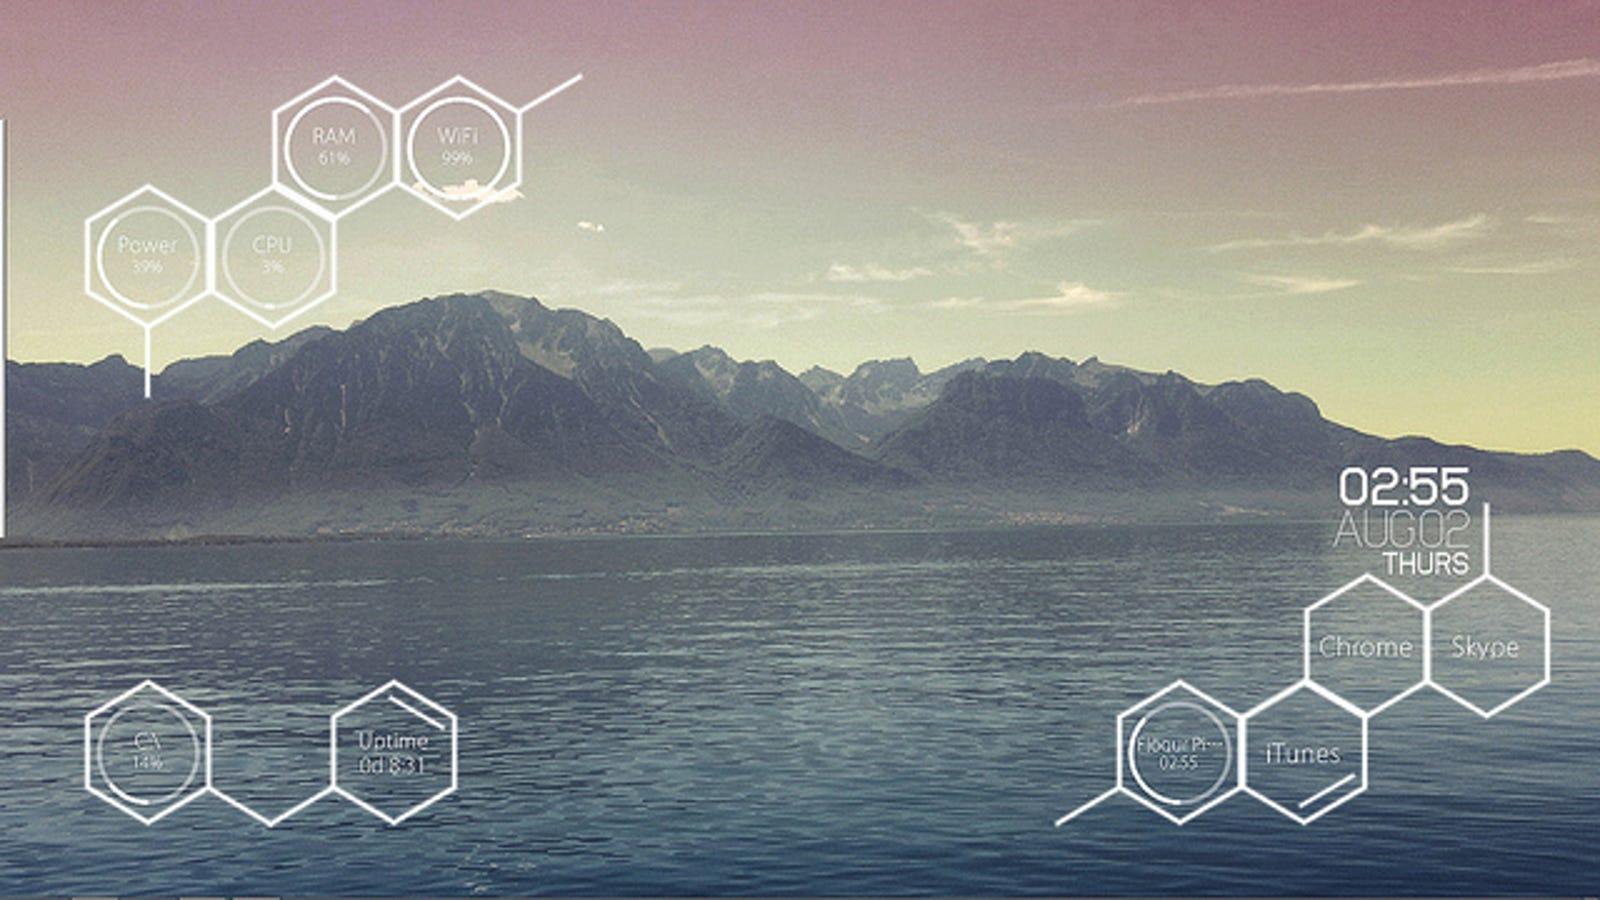 The Molecular Desktop